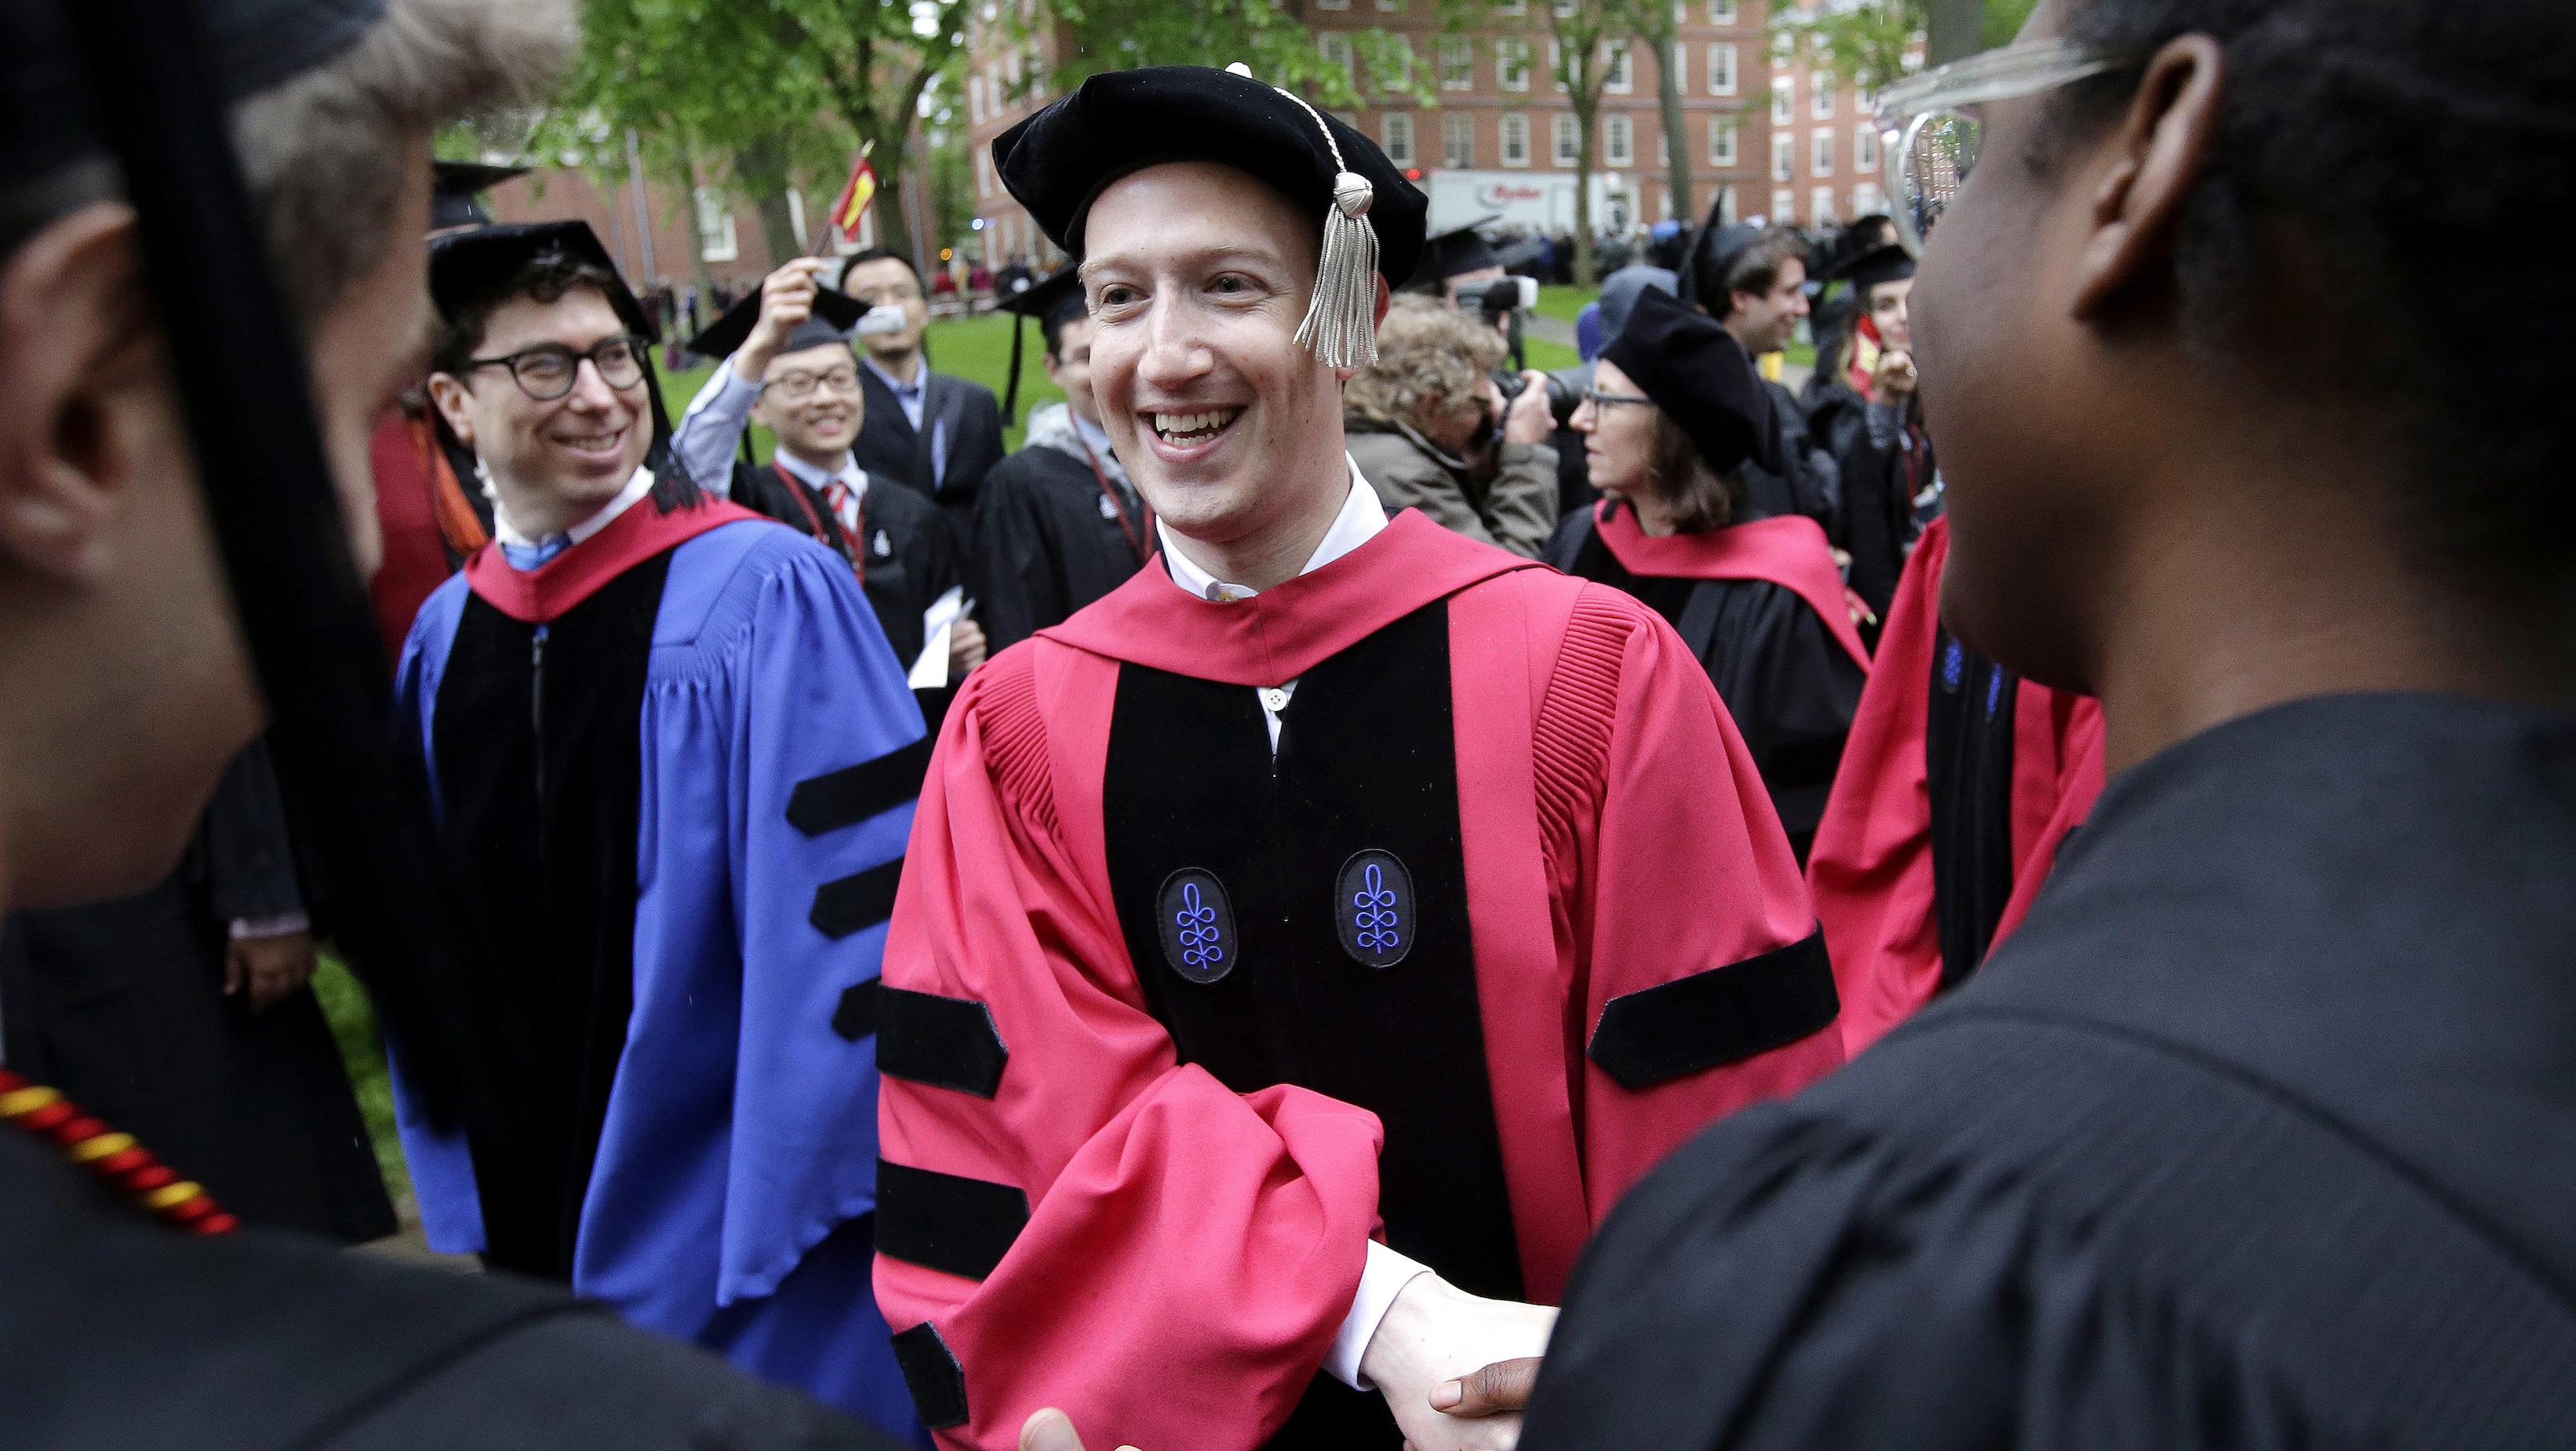 Mark Zuckerberg - Harvard Dropout to Co-Founder of Facebook 7